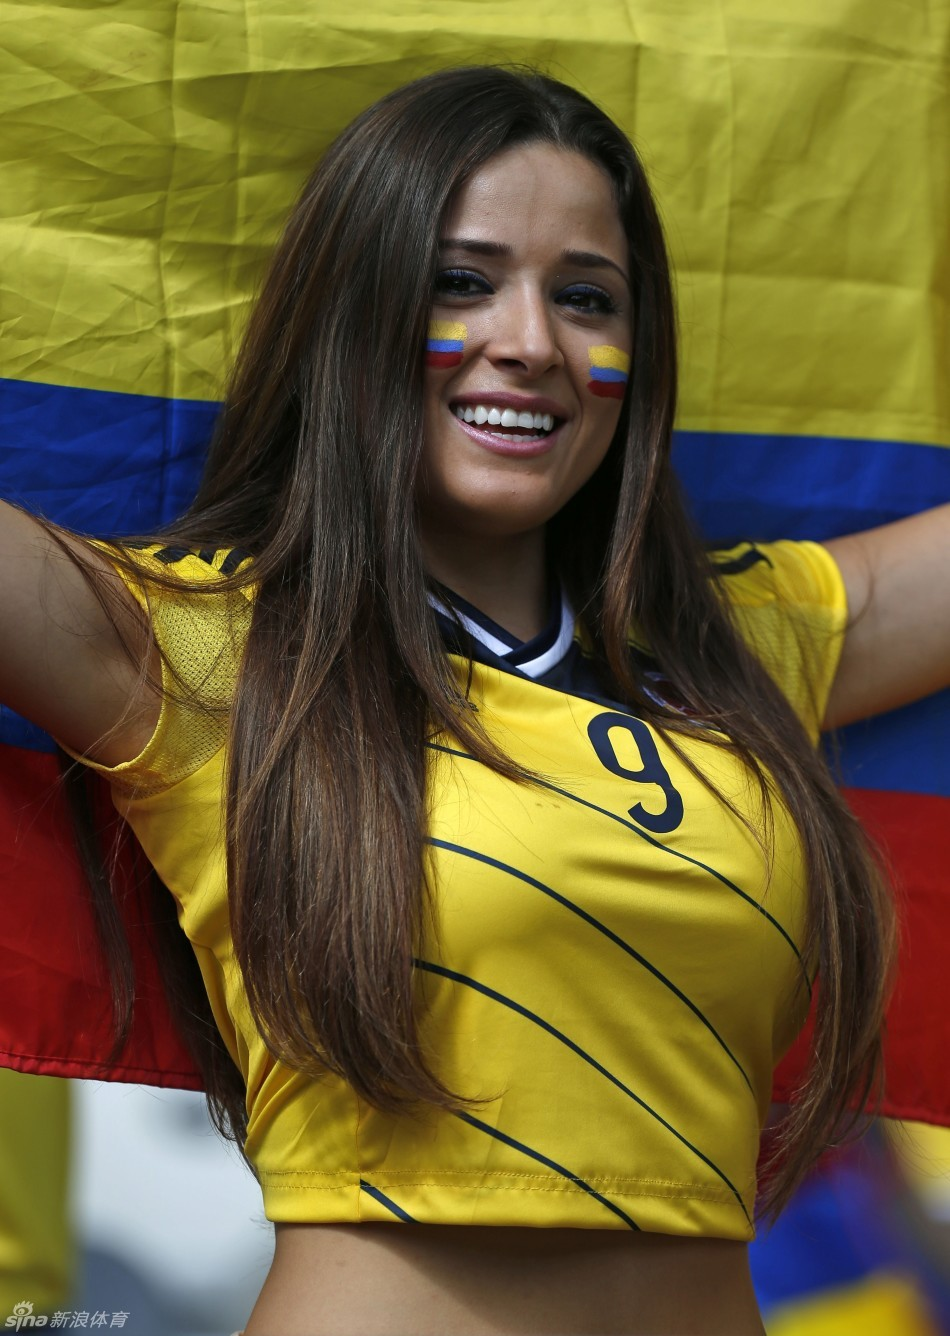 Chicas Bonitas En Copa Mundial 5